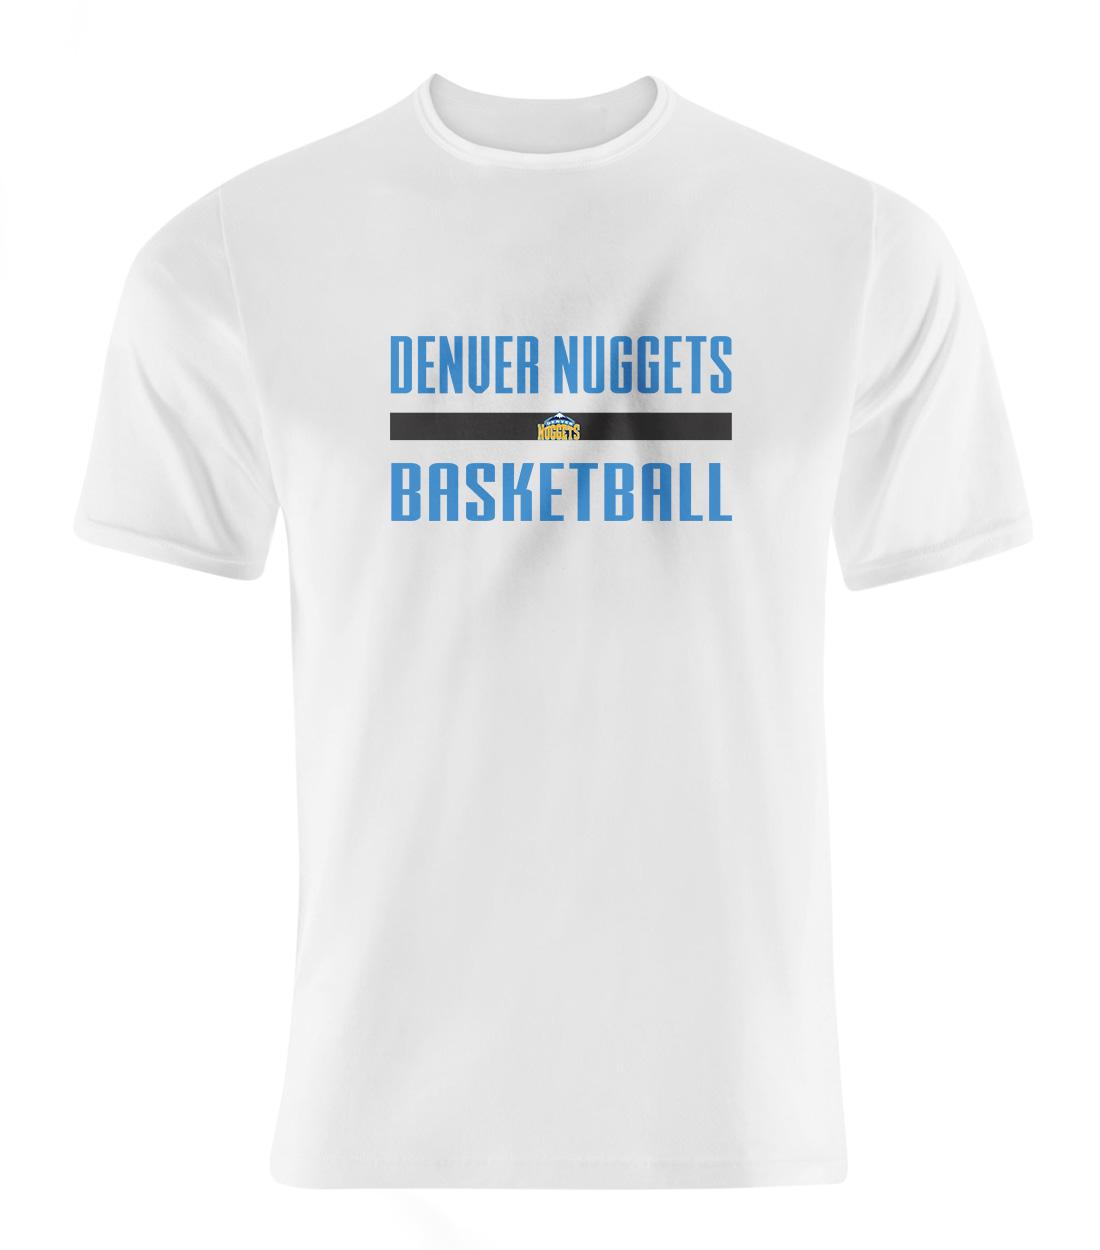 Denver  Basketball Tshirt (TSH-wht-SKR-nuggets.bsktbll-509)